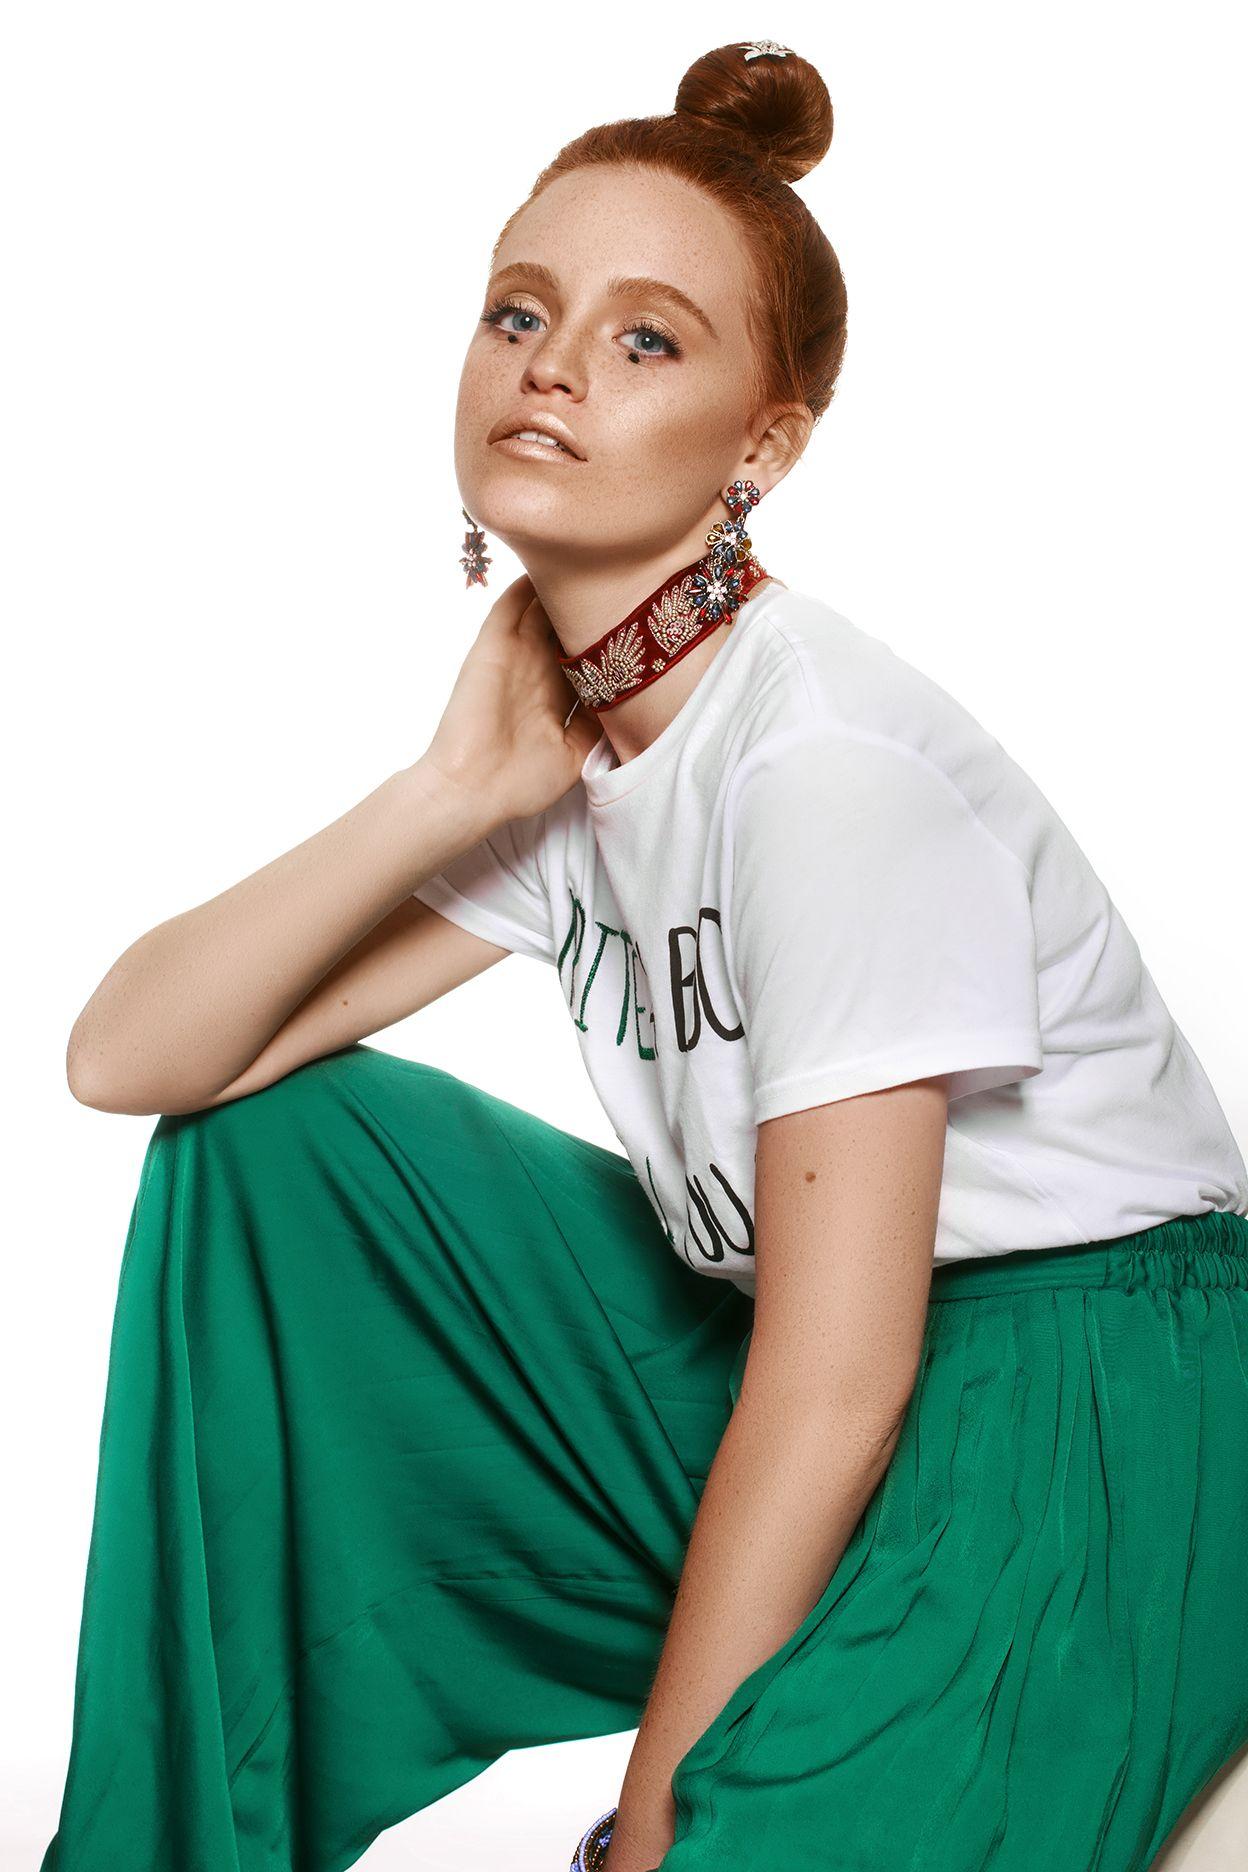 Hanna Balwierczak Model Citizen Magazine ™ Fashion